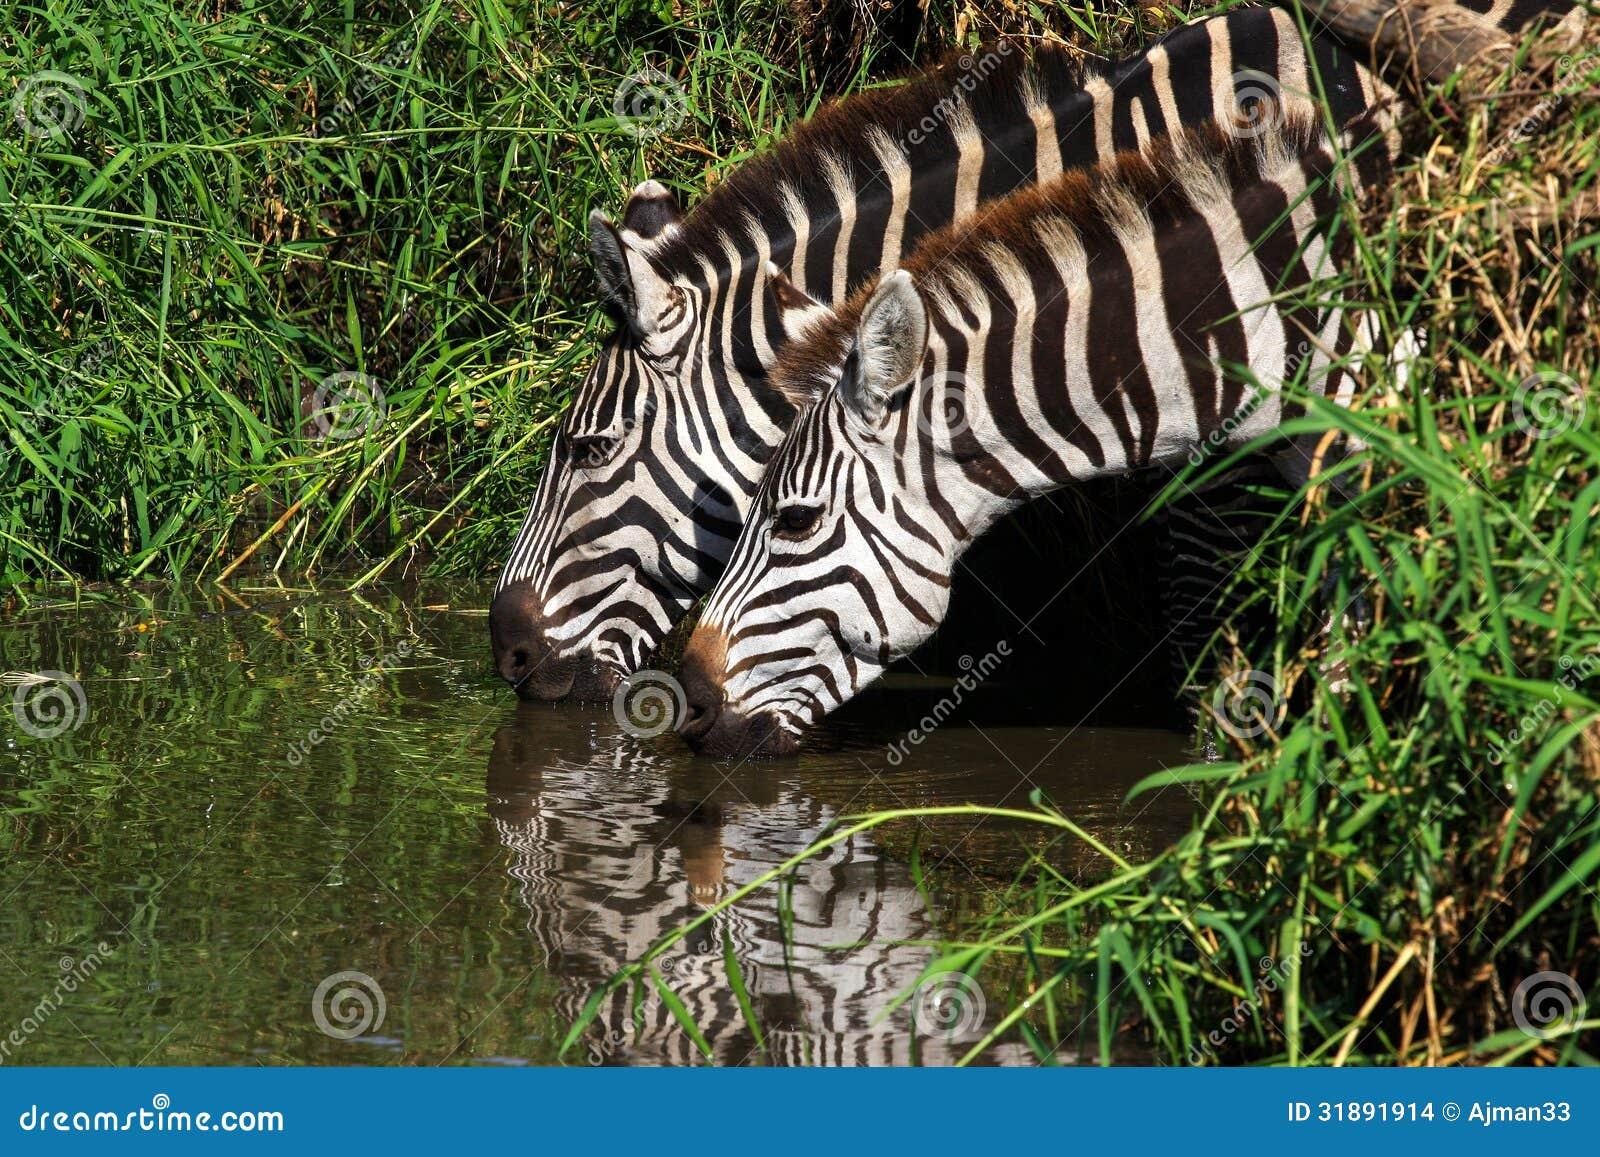 Zebras In Africa Map